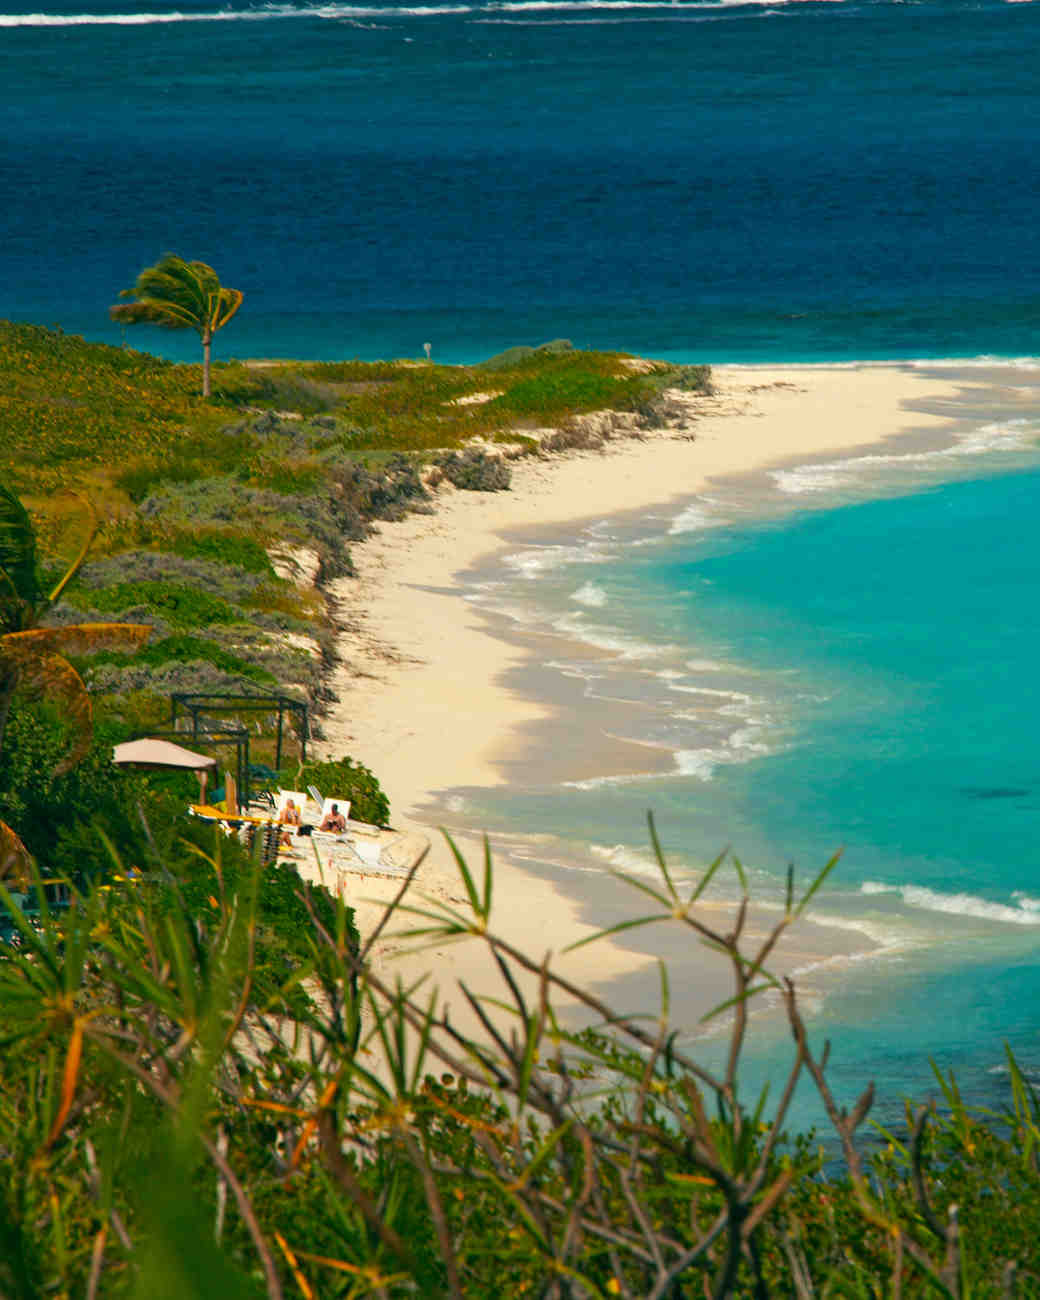 caribbean-anguilla-beach-shoal-bay-w11-0315.jpg